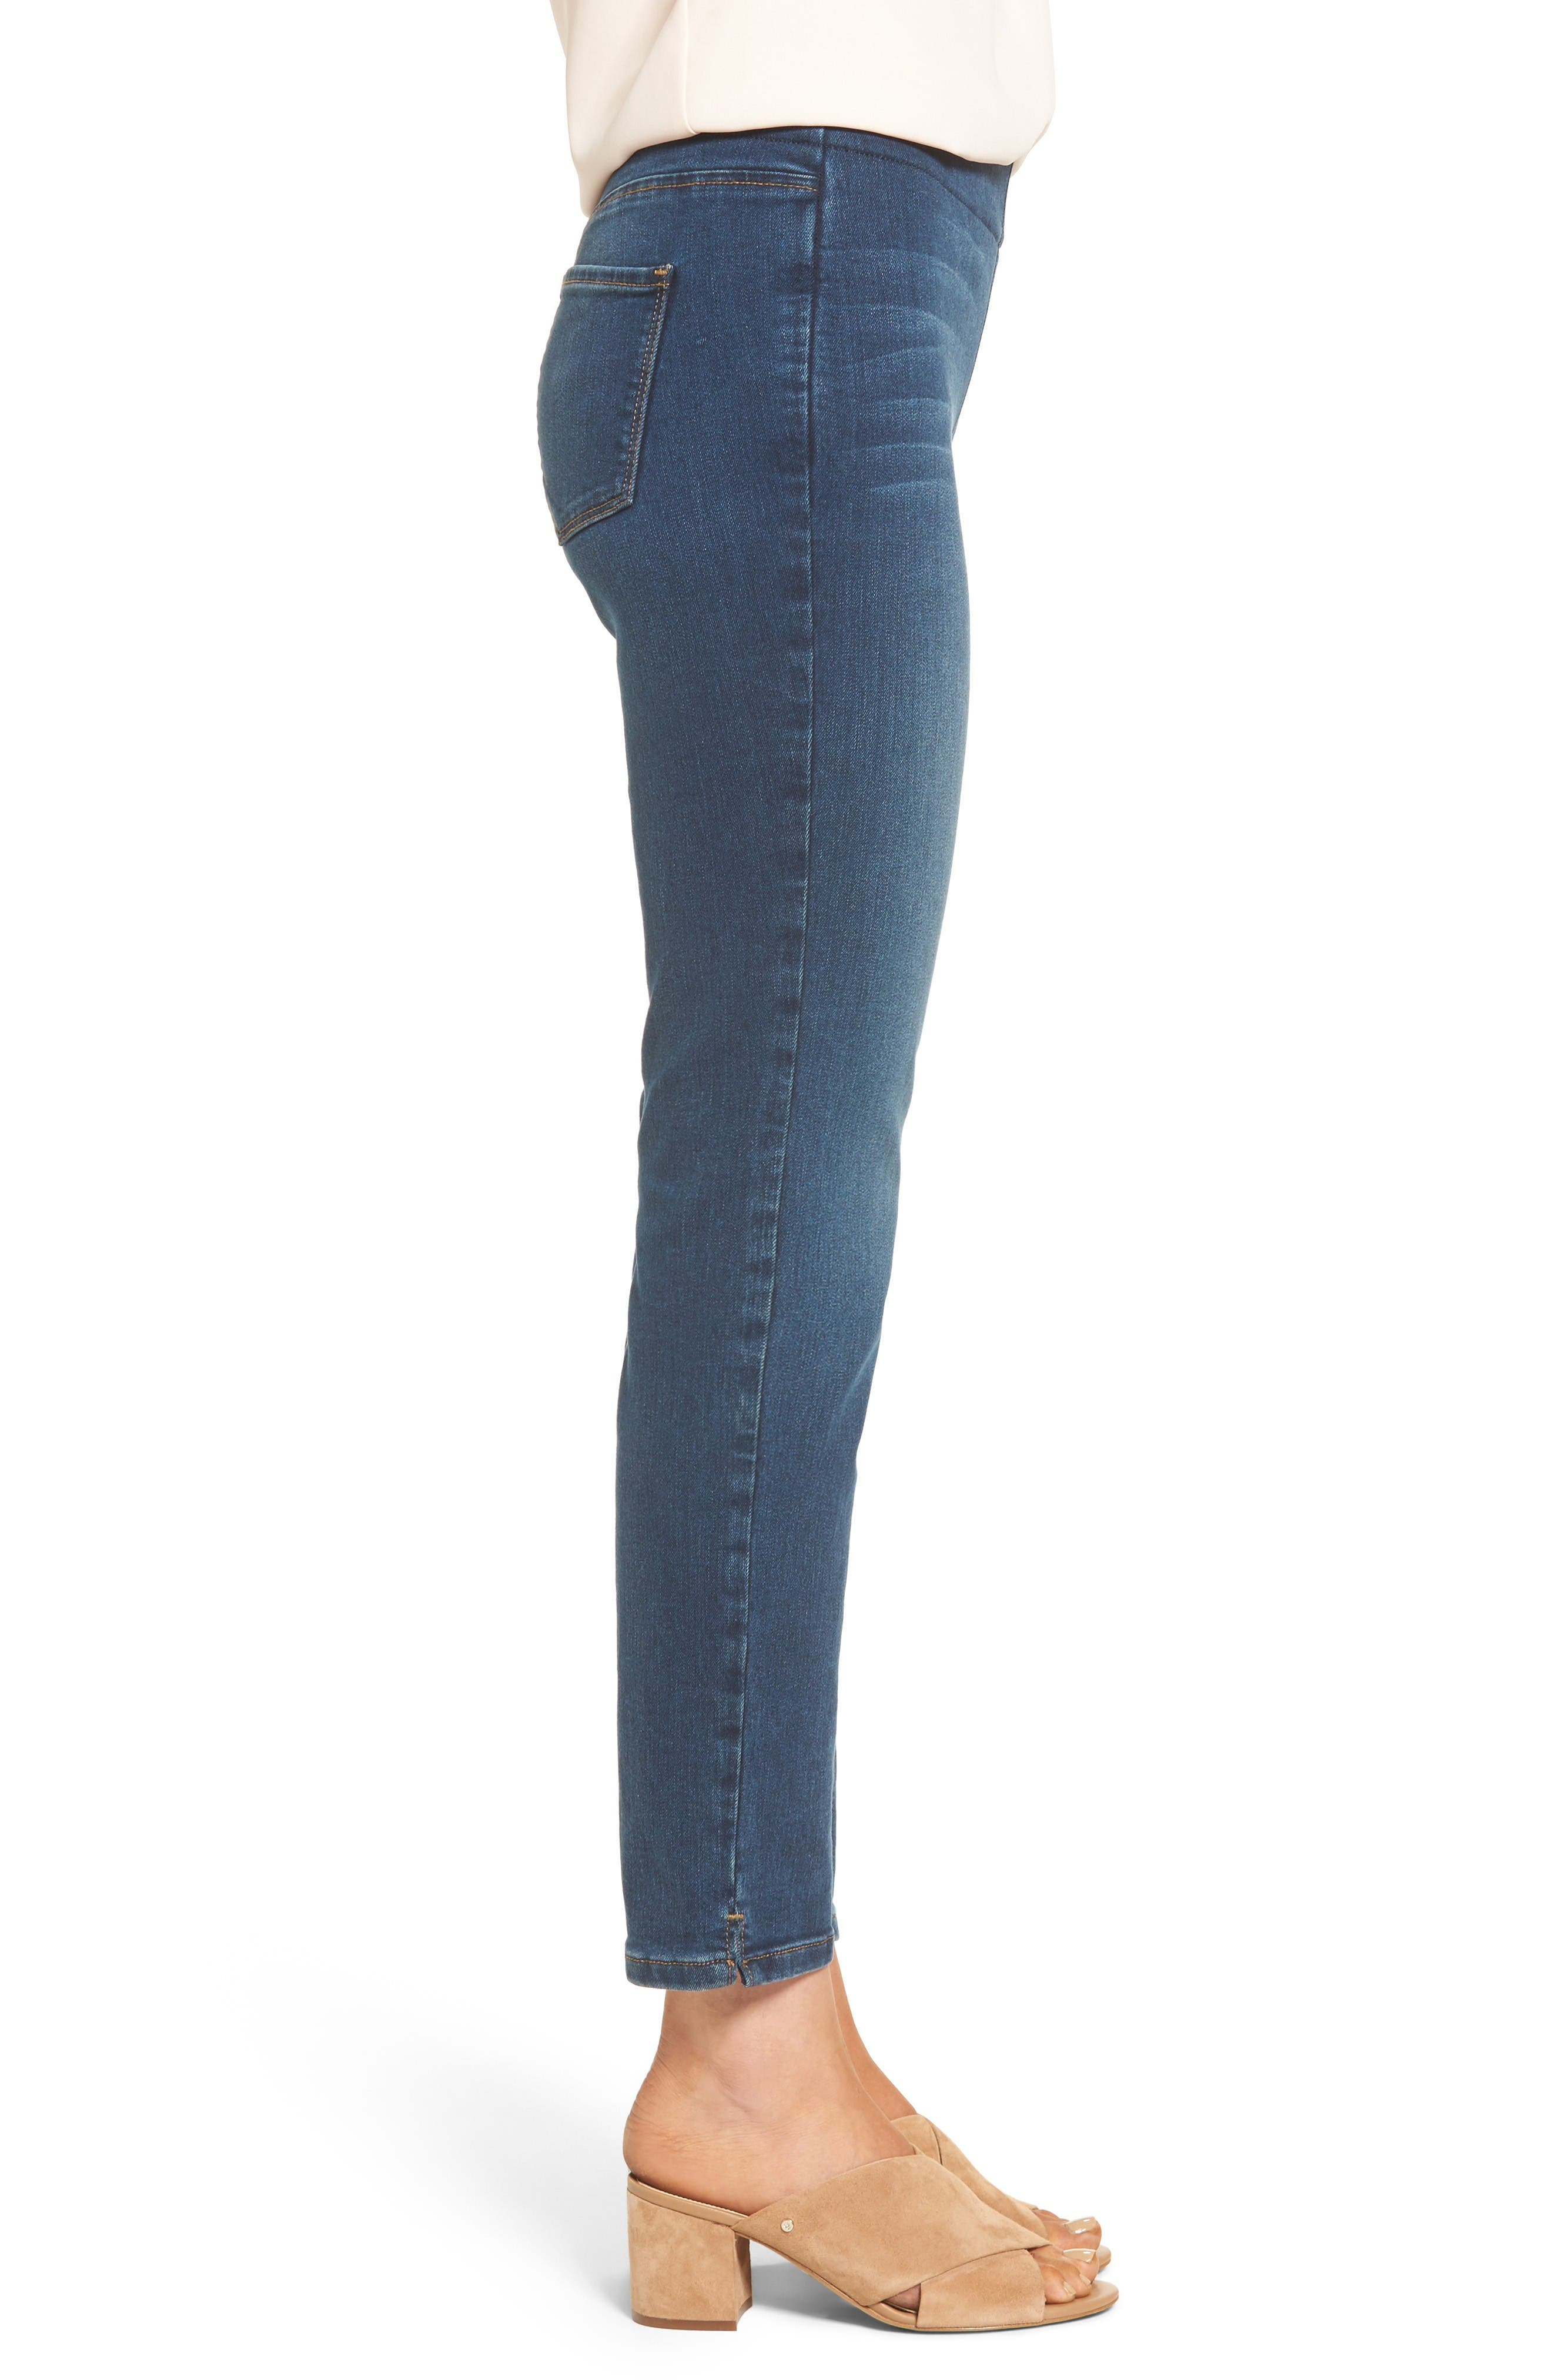 Alternate Image 3  - NYDJ Alina Pull-On Stretch Ankle Skinny Jeans (Sea Breeze) (Regular & Petite)